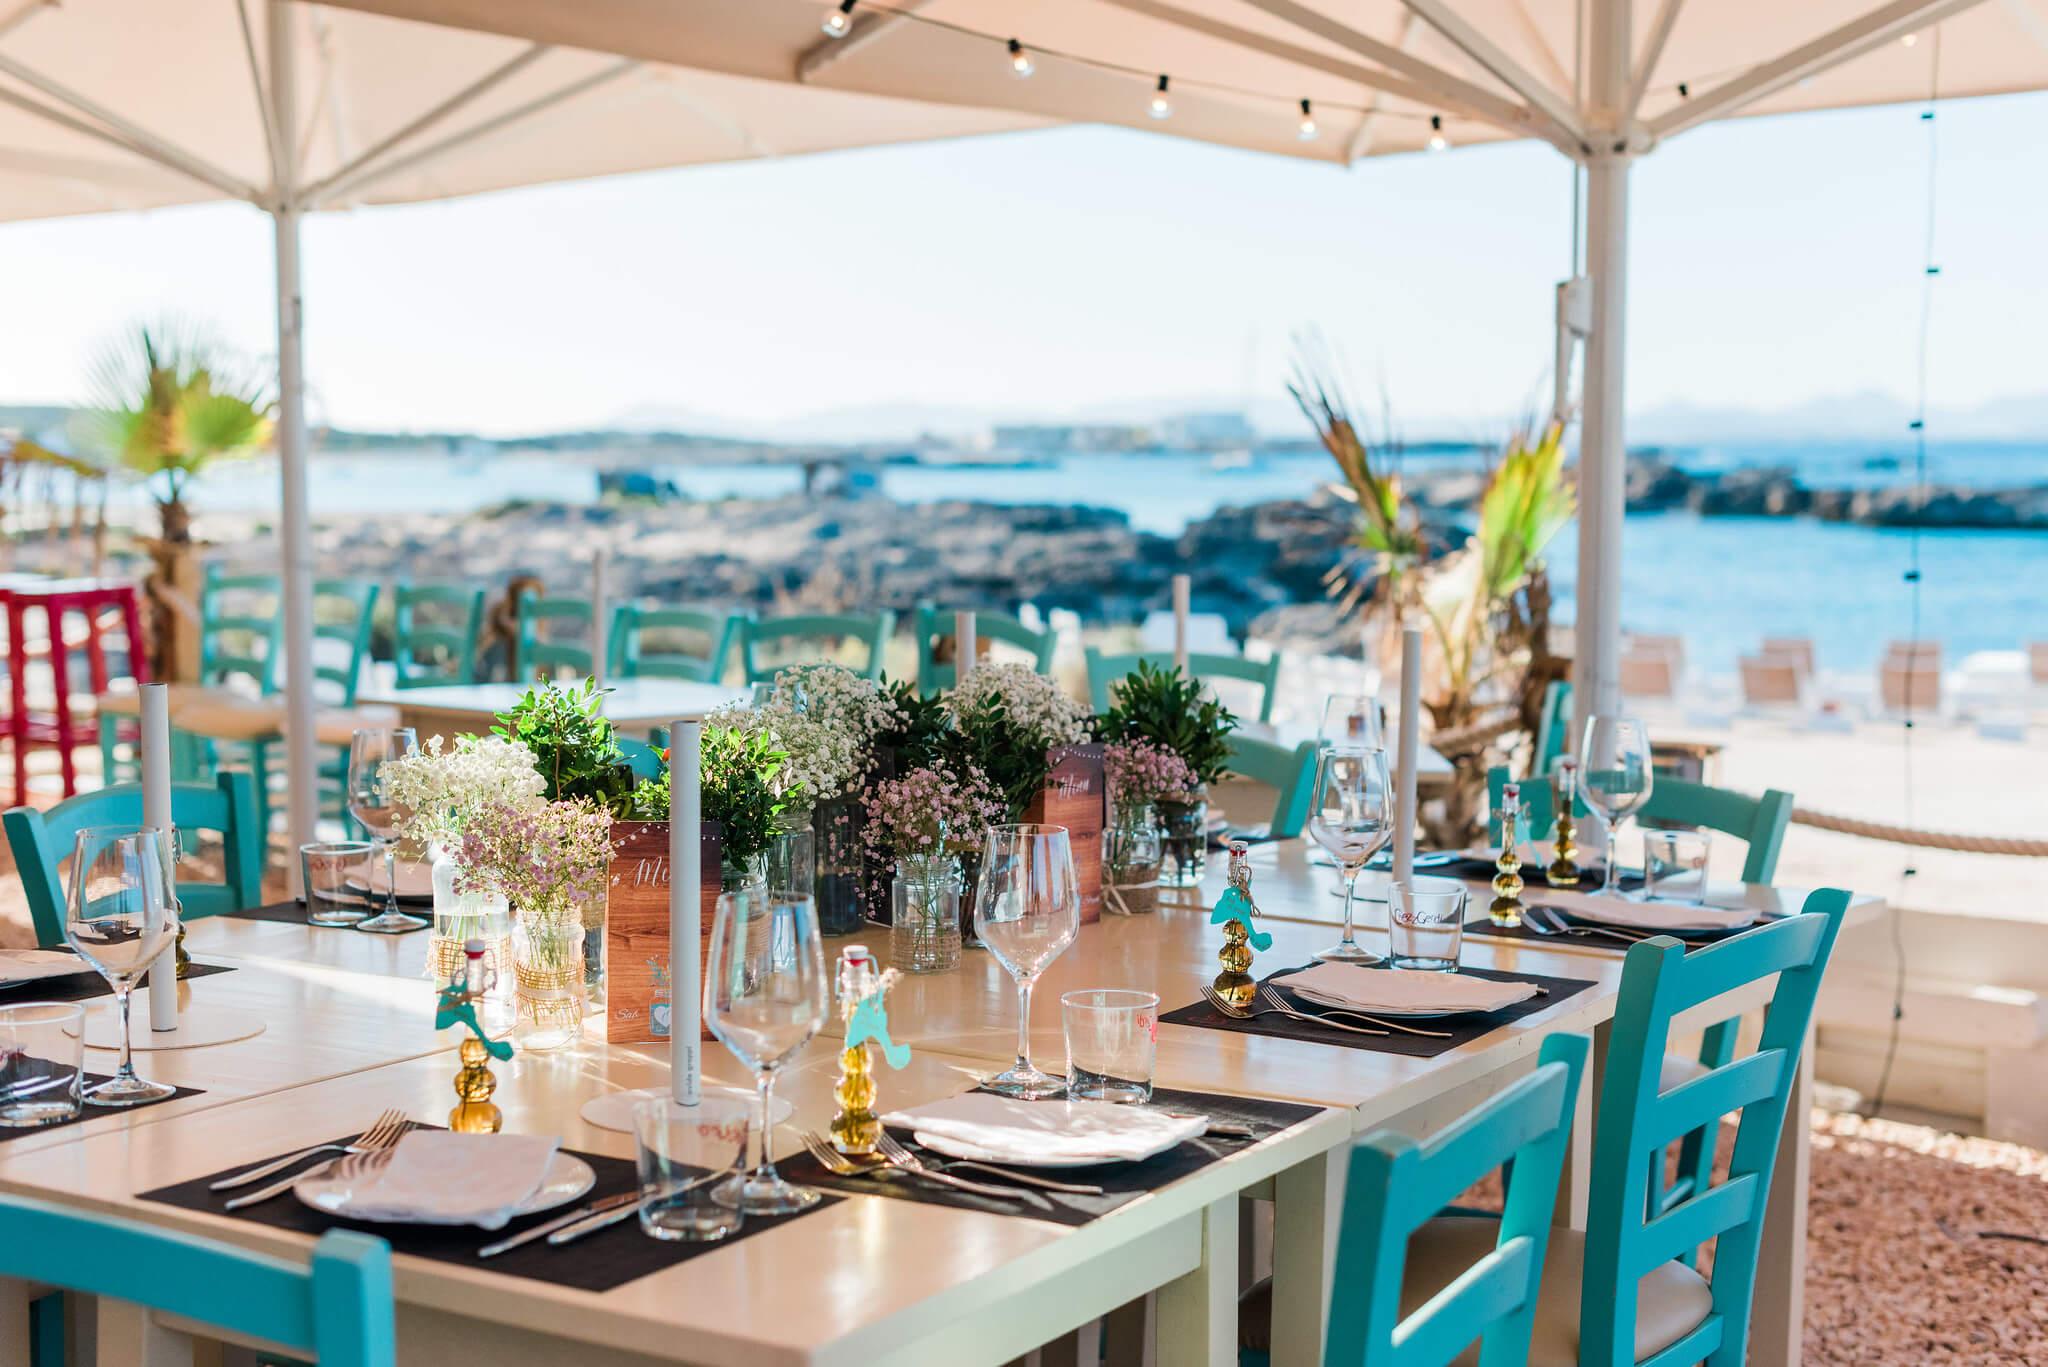 https://www.white-ibiza.com/wp-content/uploads/2020/03/formentera-beach-restaurants-chezz-gerdi-2020-04.jpg